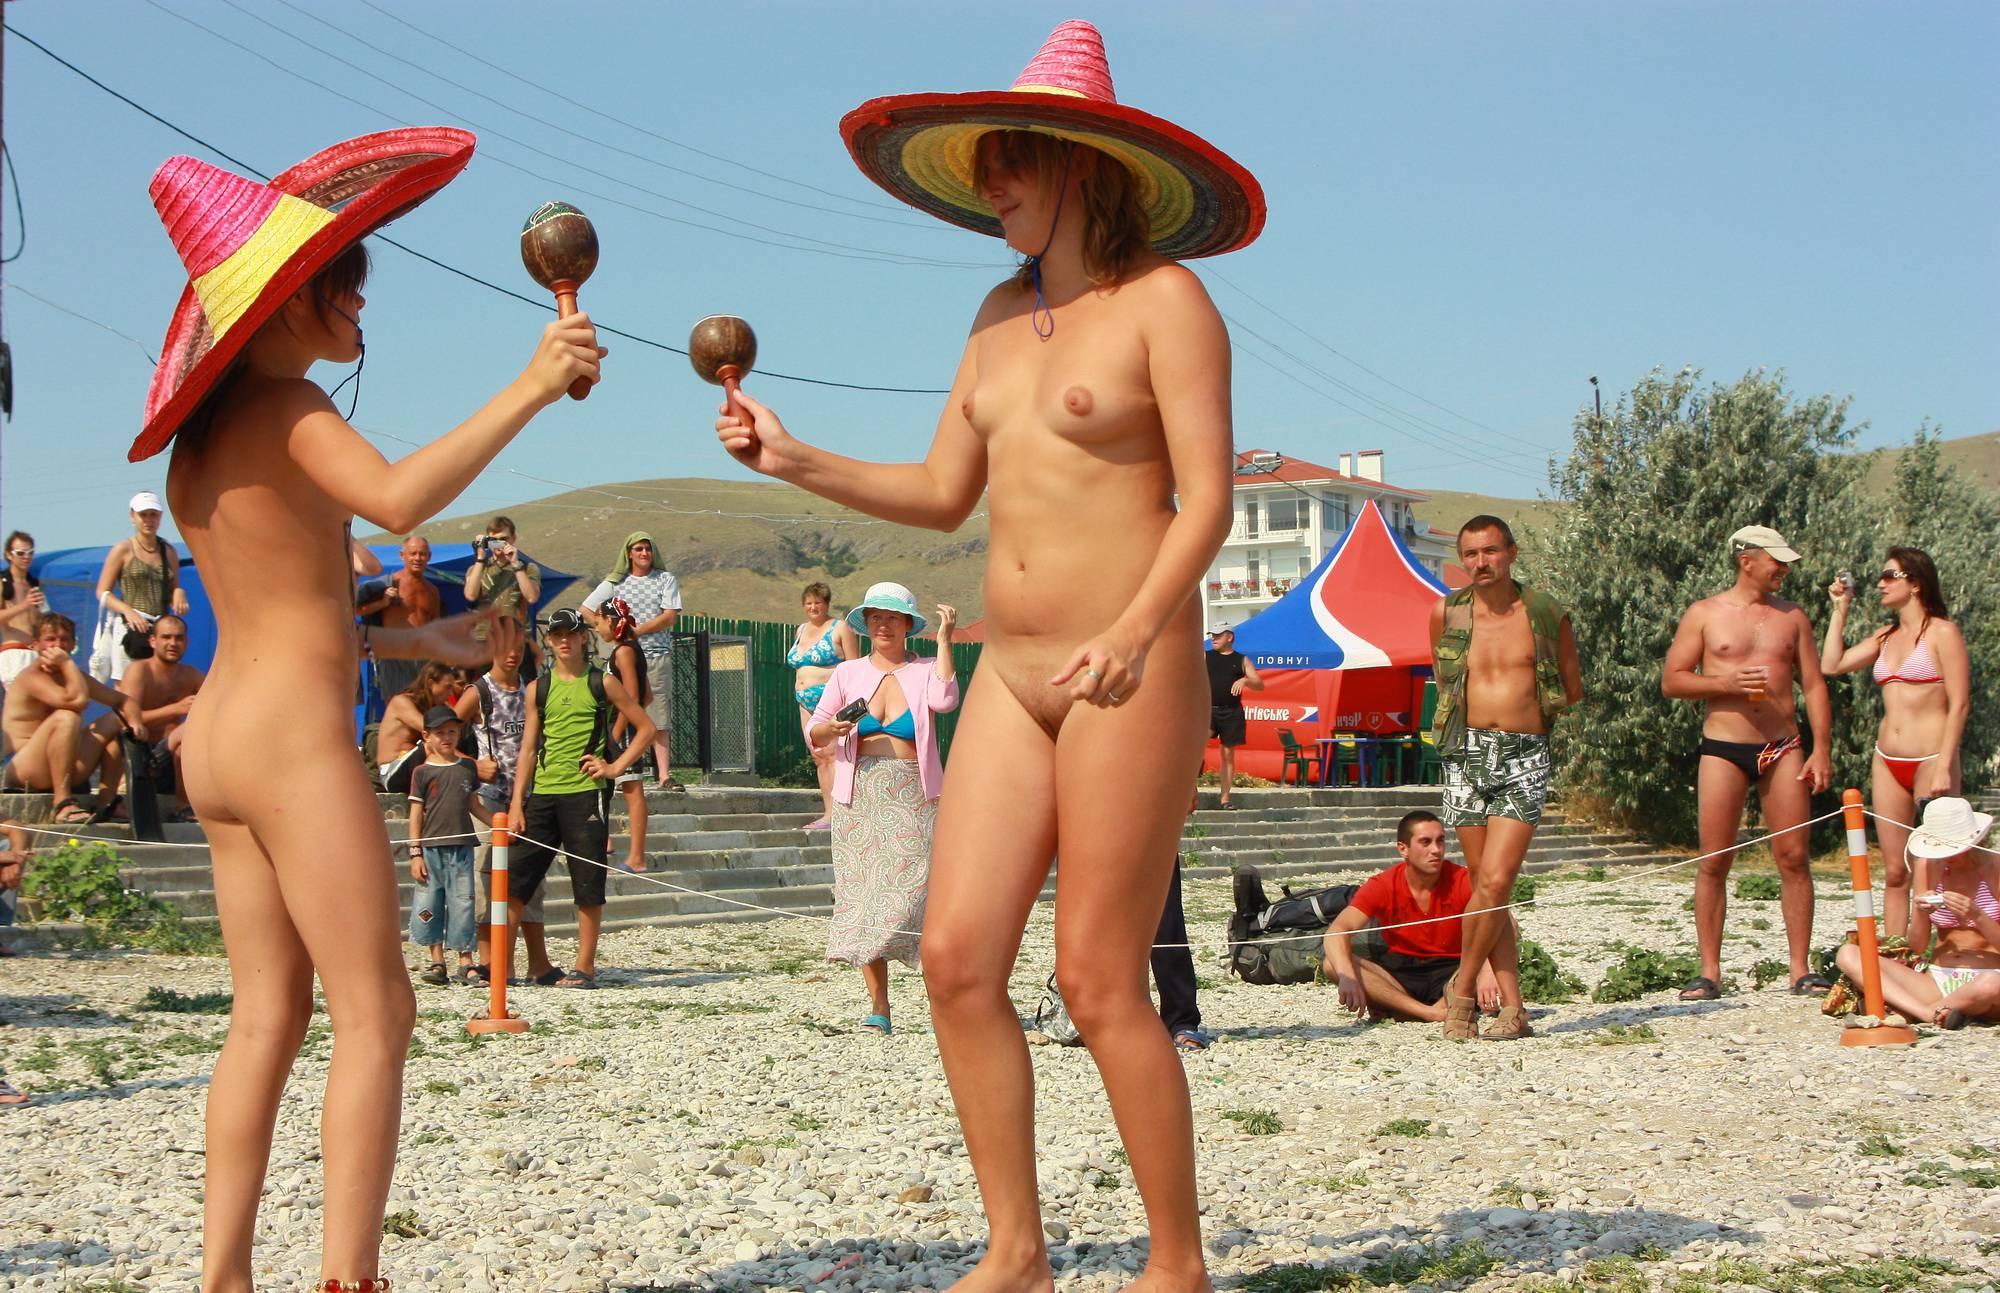 Nudist Pics Neptune Mexican Dance - 1